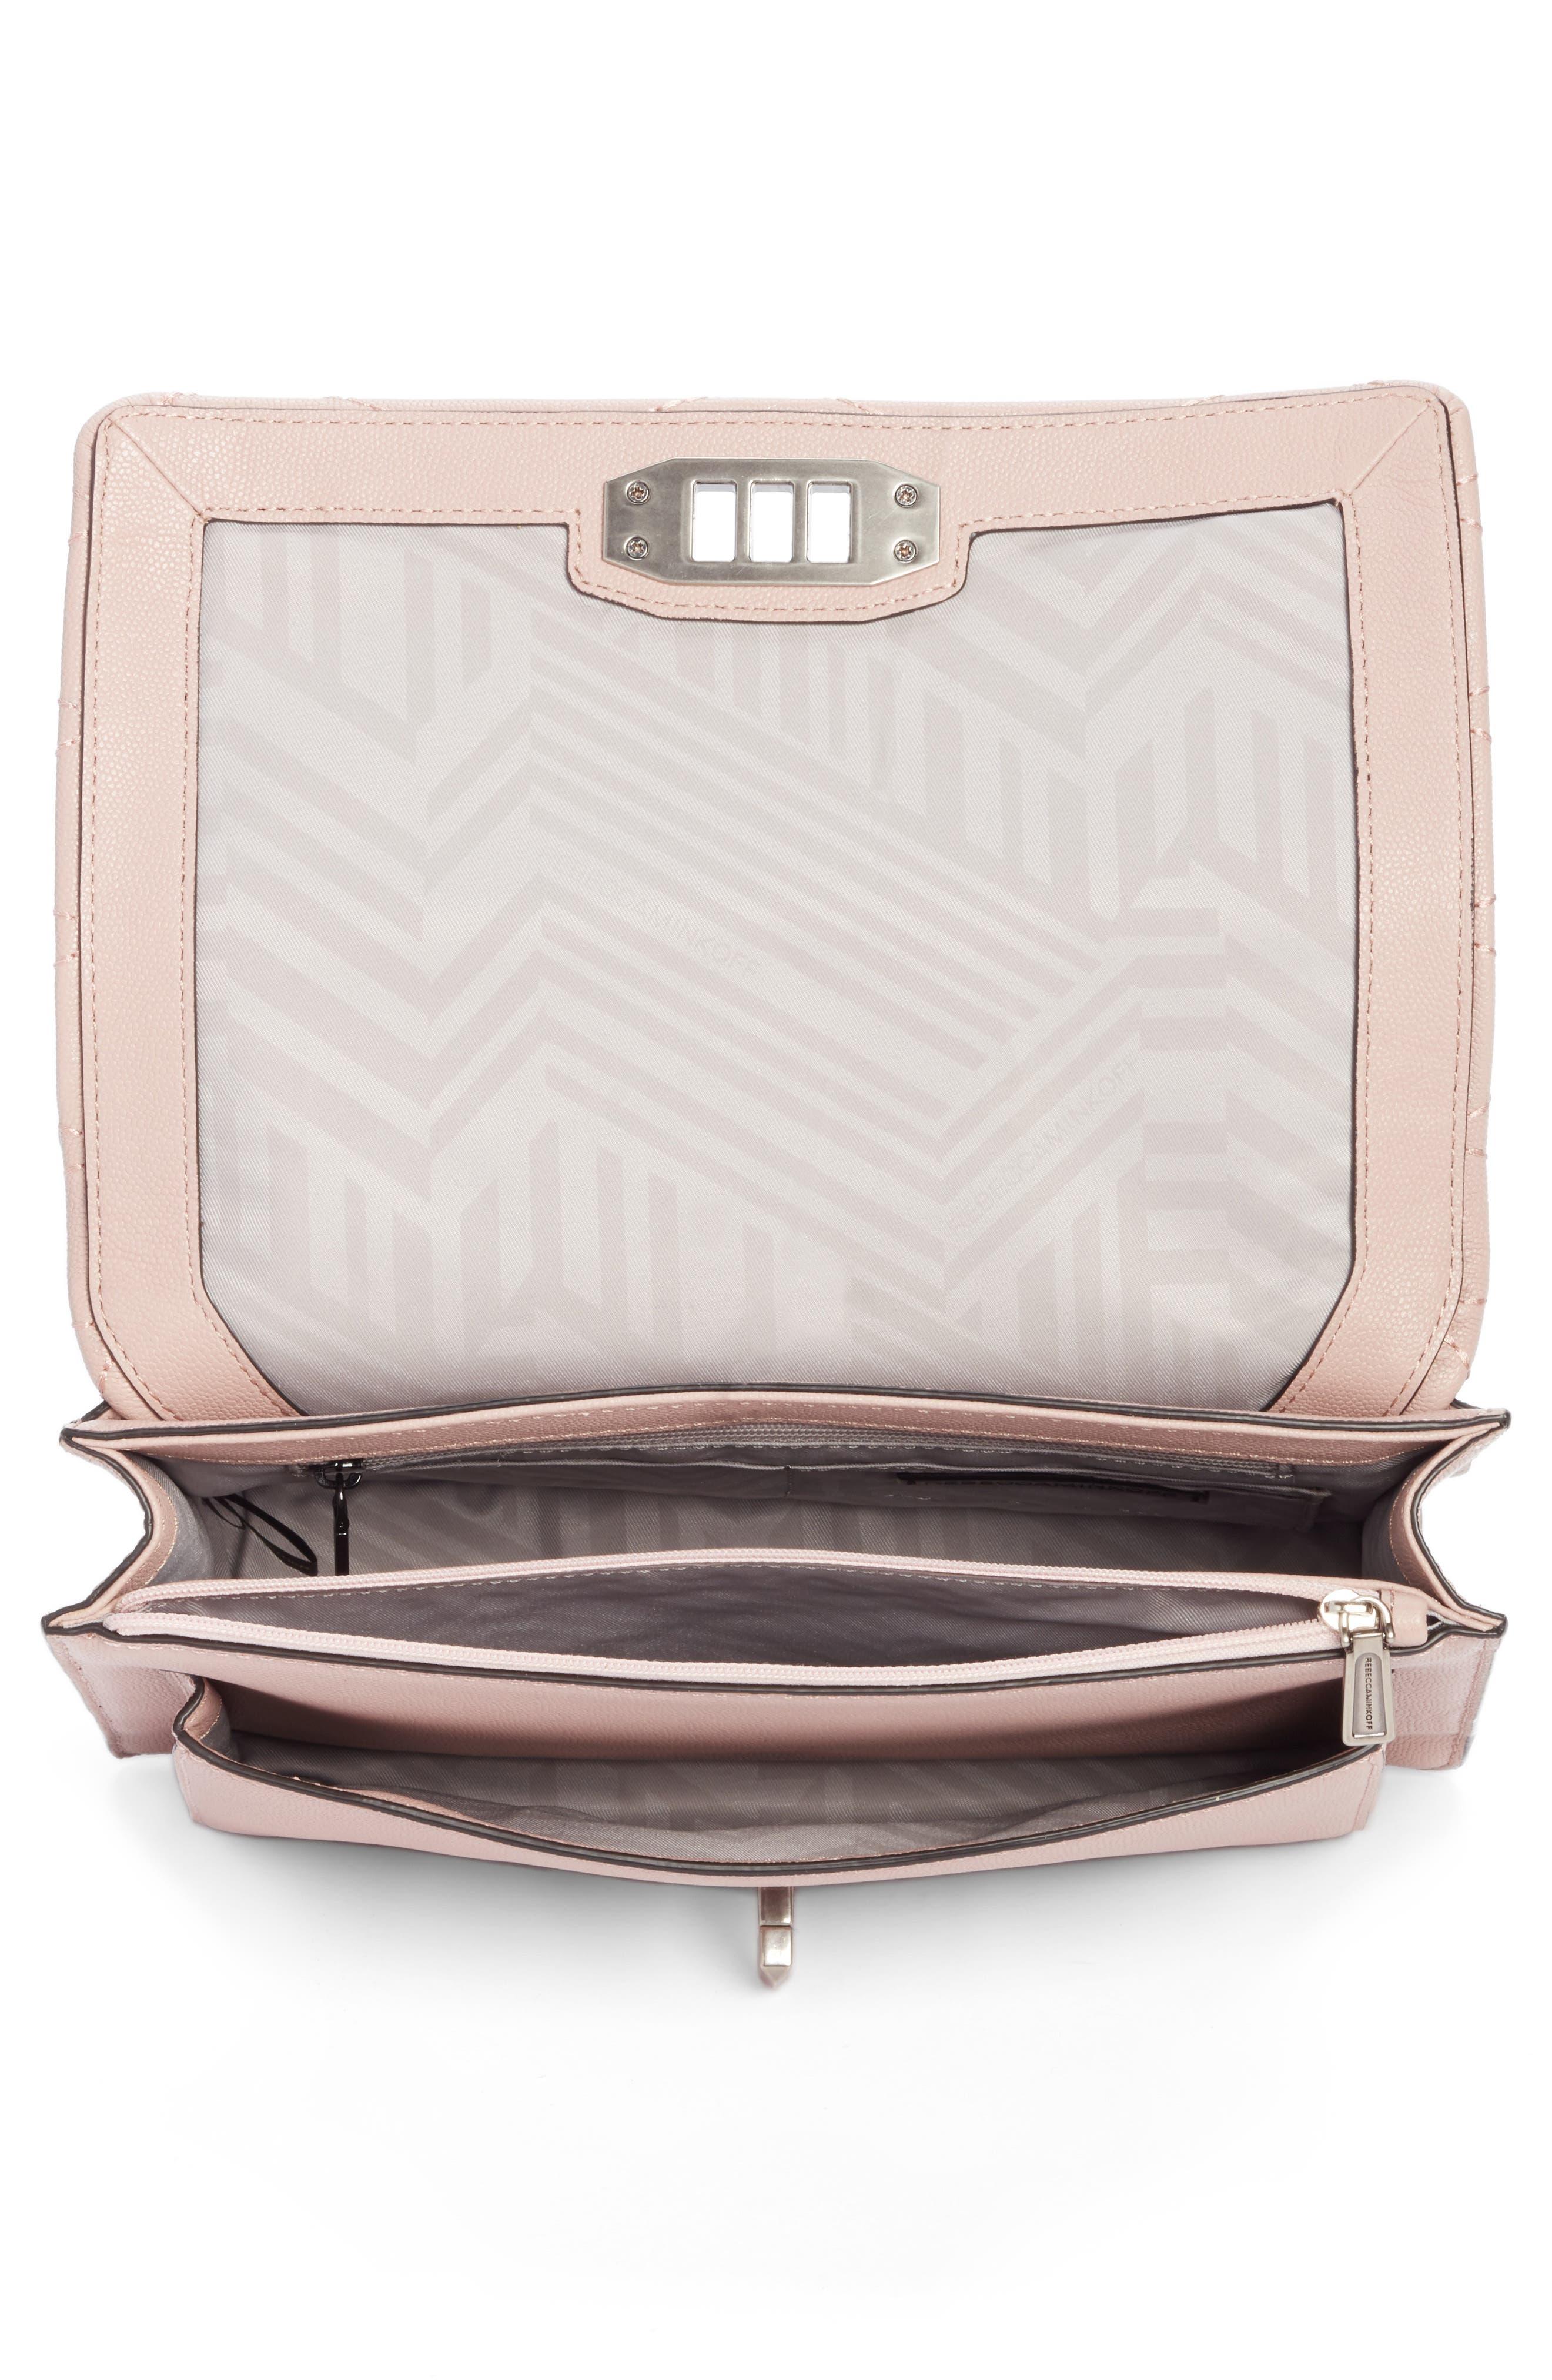 Medium Je T'aime Convertible Leather Crossbody Bag,                             Alternate thumbnail 3, color,                             Vintage Pink